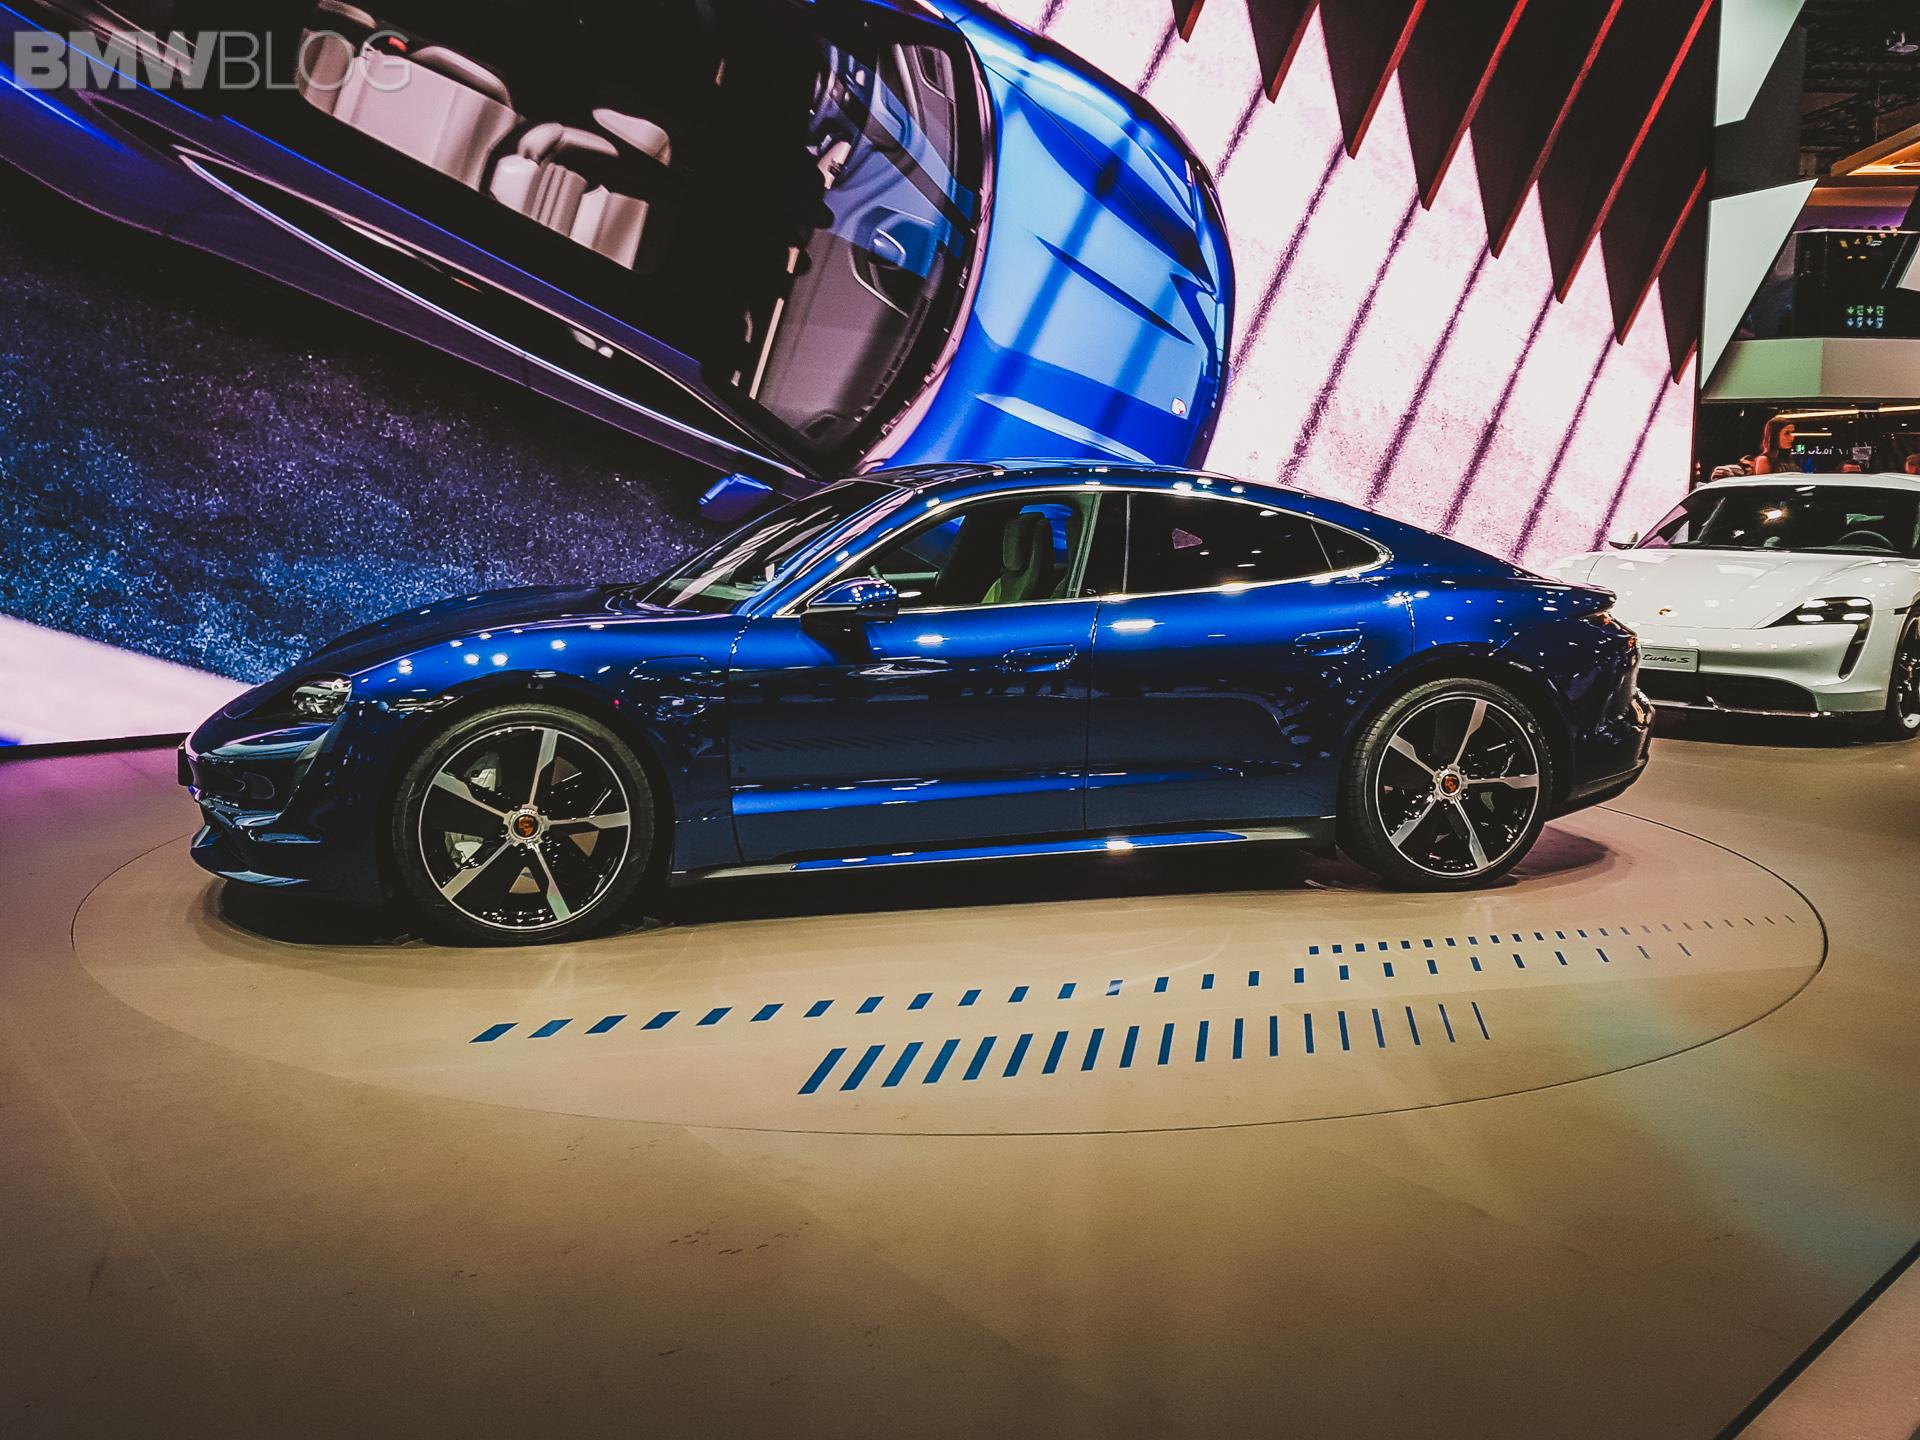 Porsche Taycan Live Photos From The 2019 Iaa